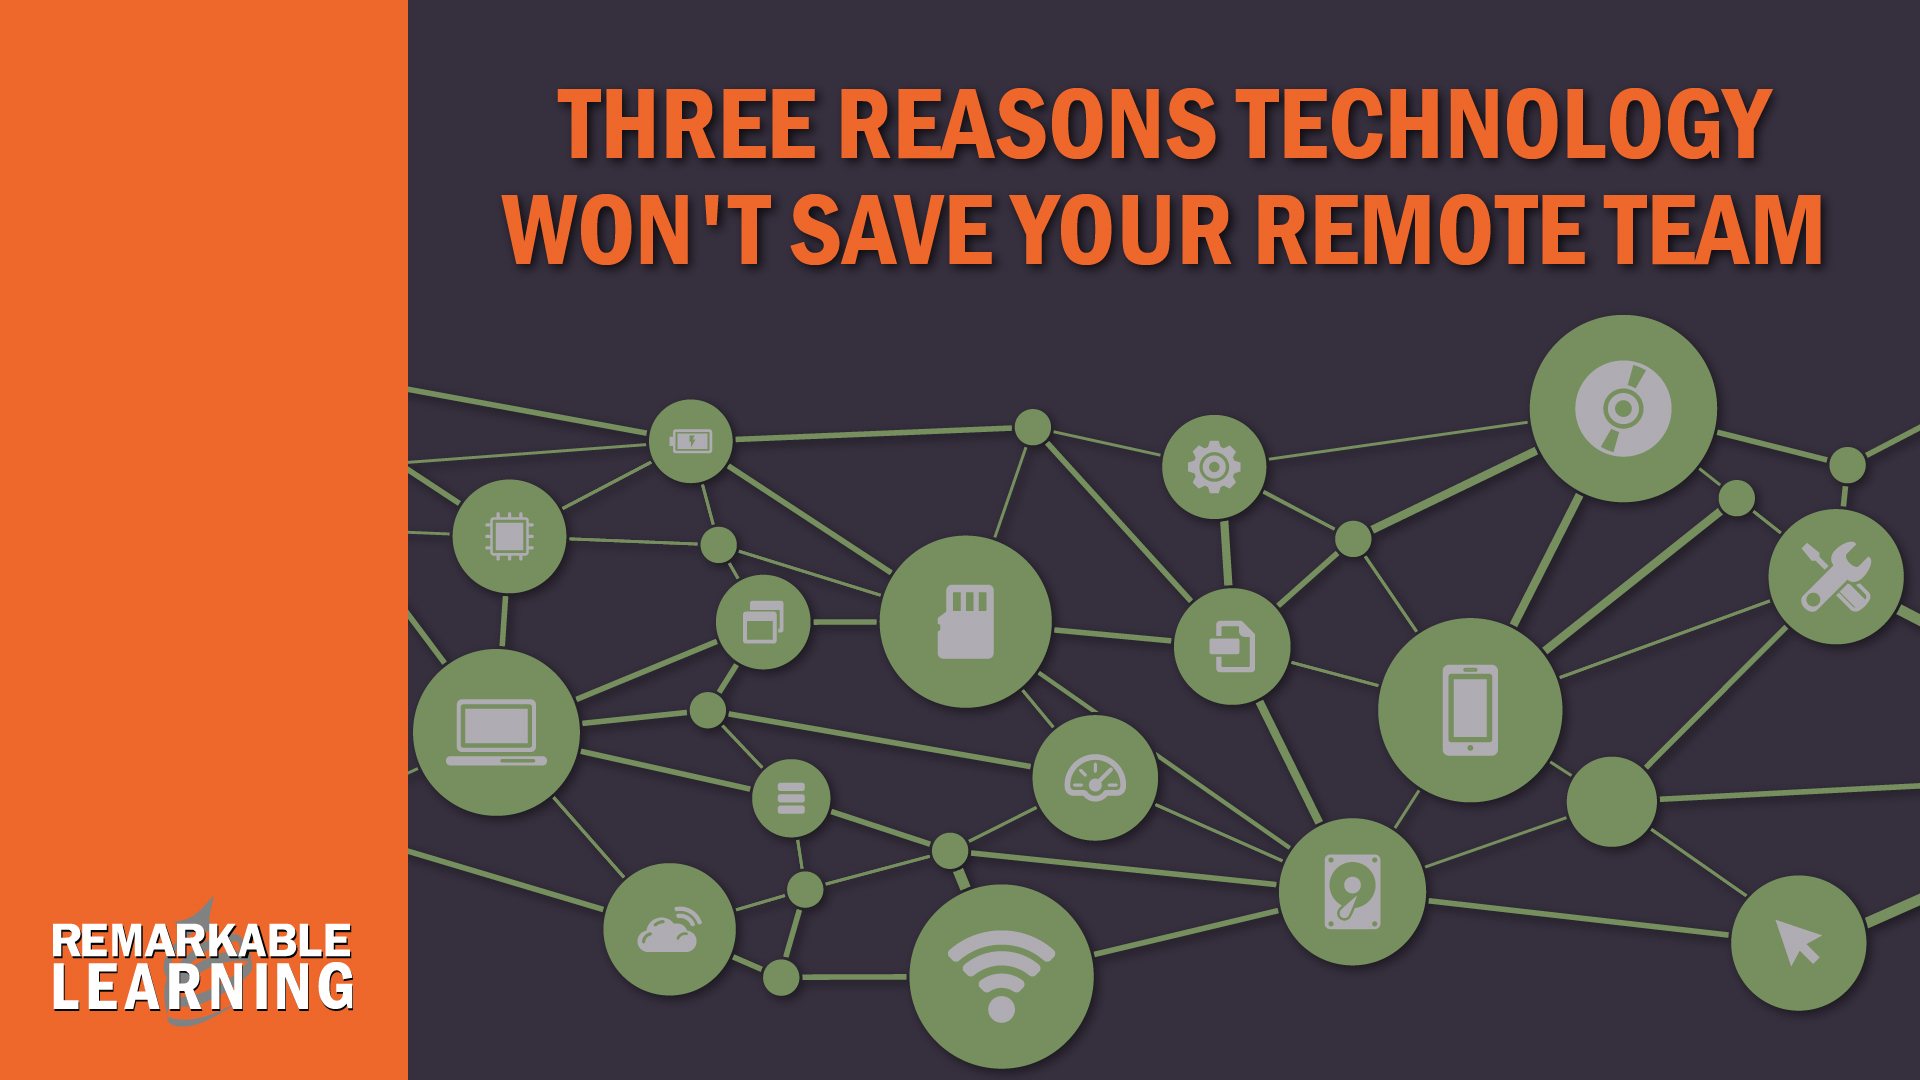 Technology isn't your savior